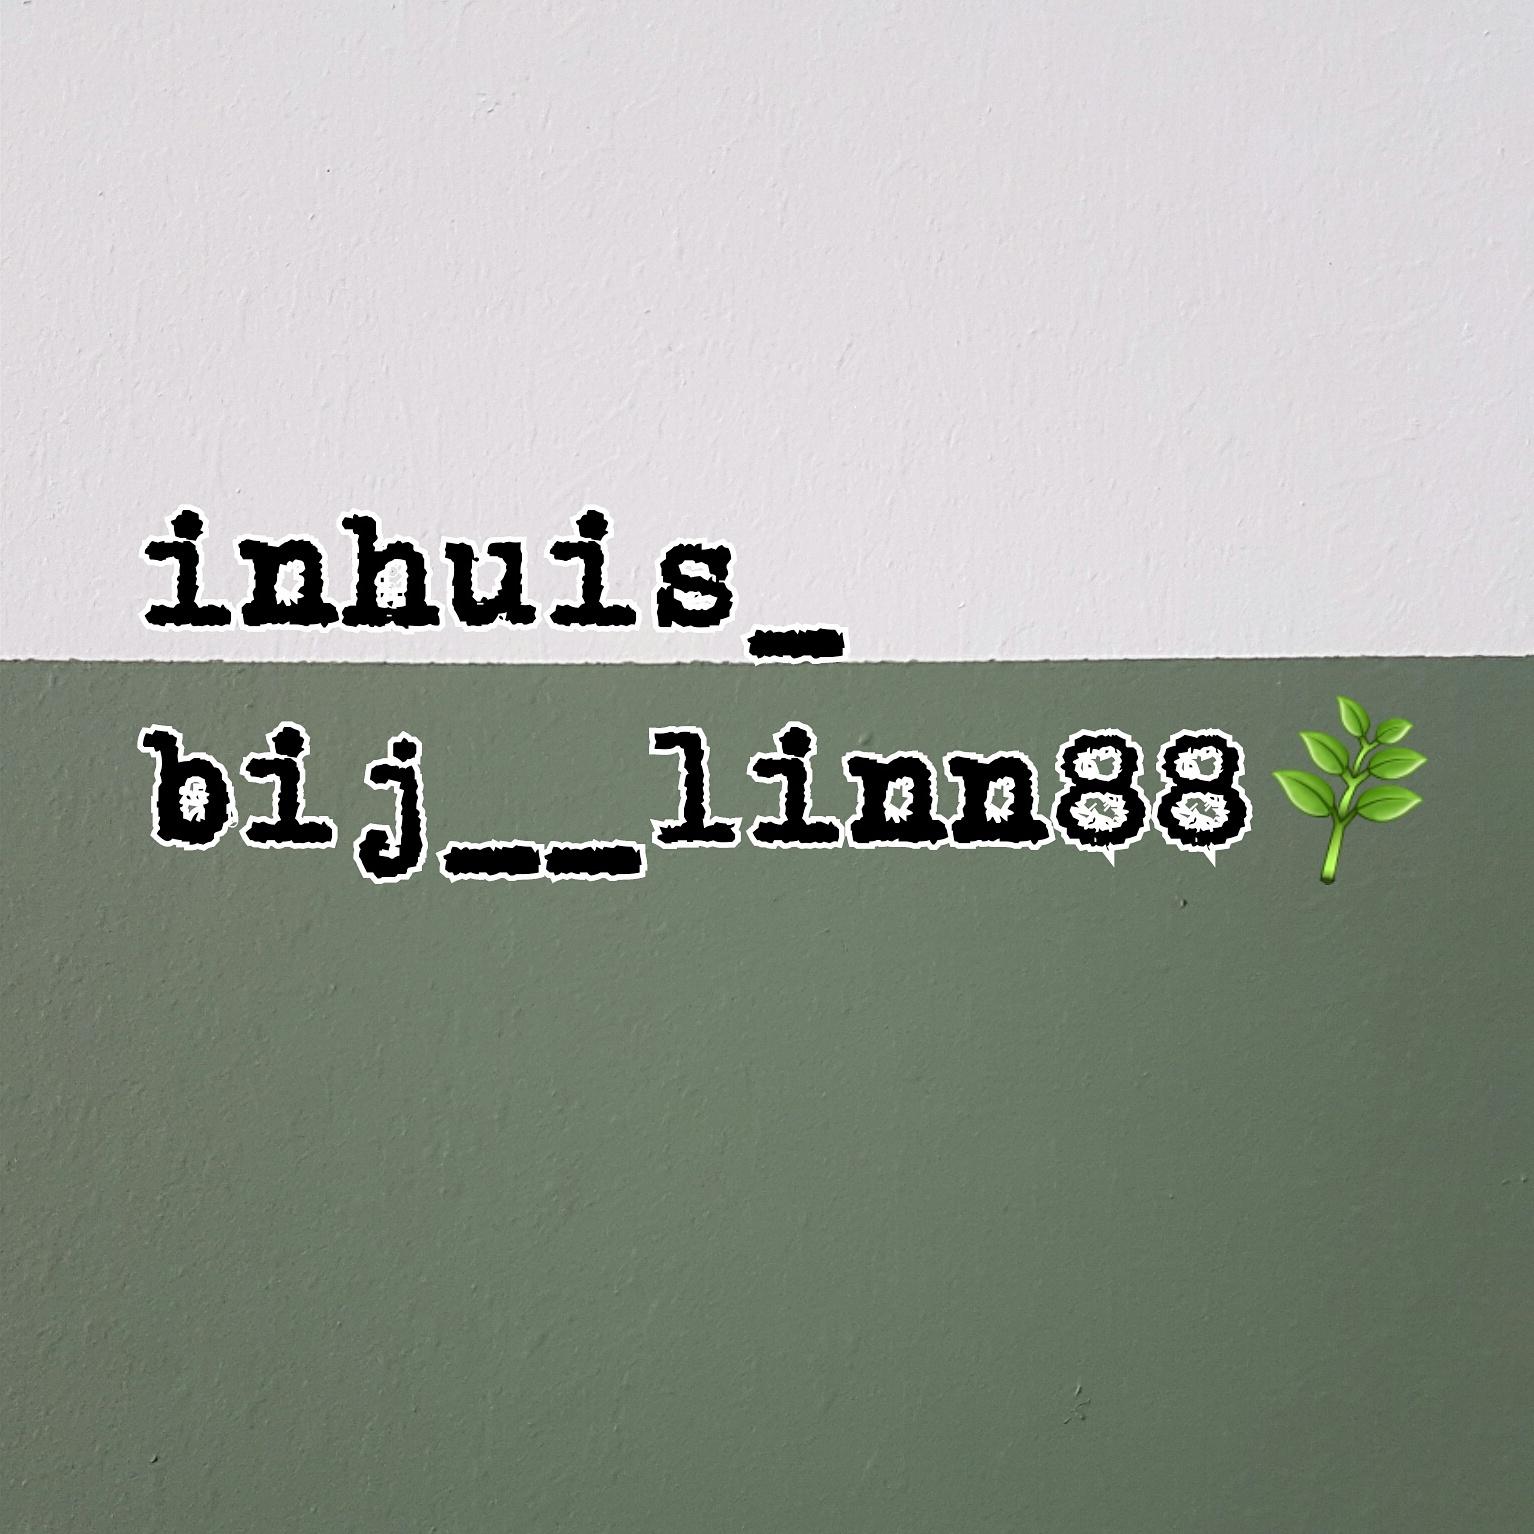 inhuis_bij__linn88